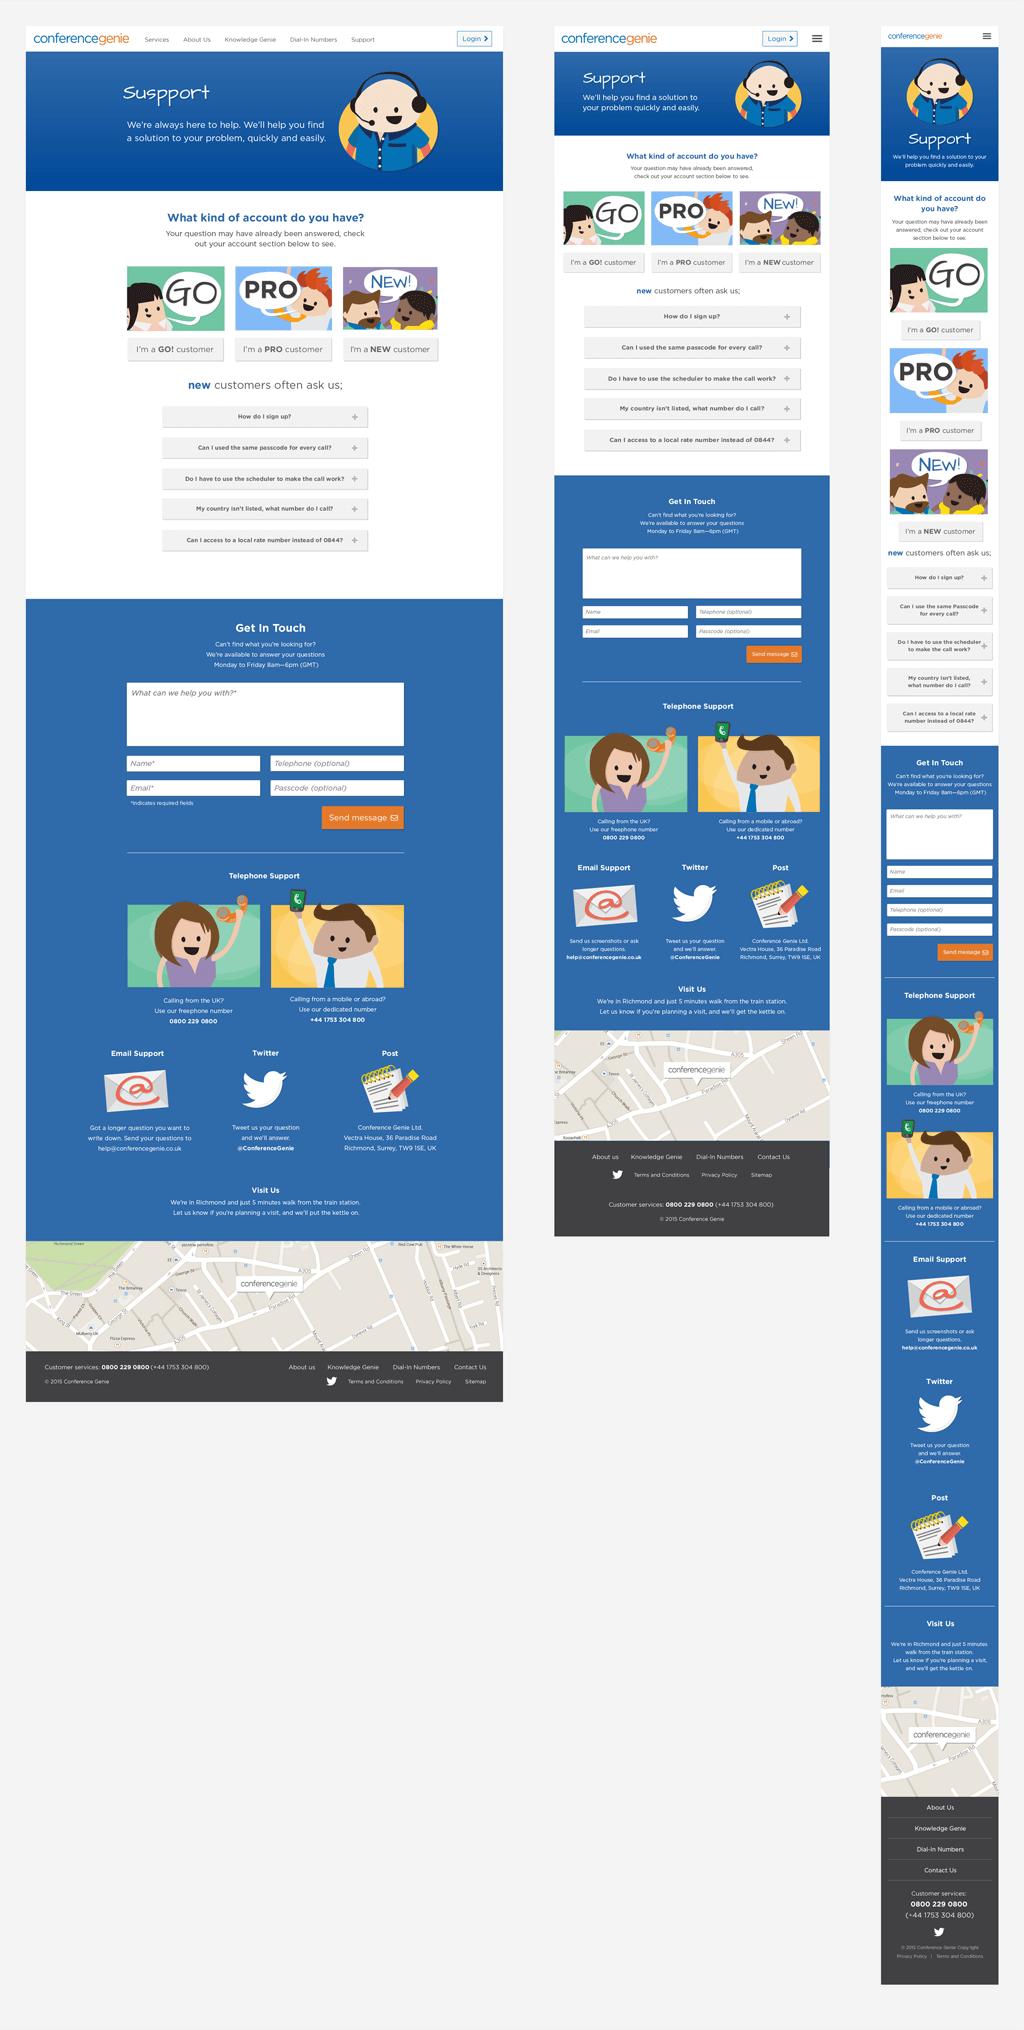 Conference Genie — repsonsive web design